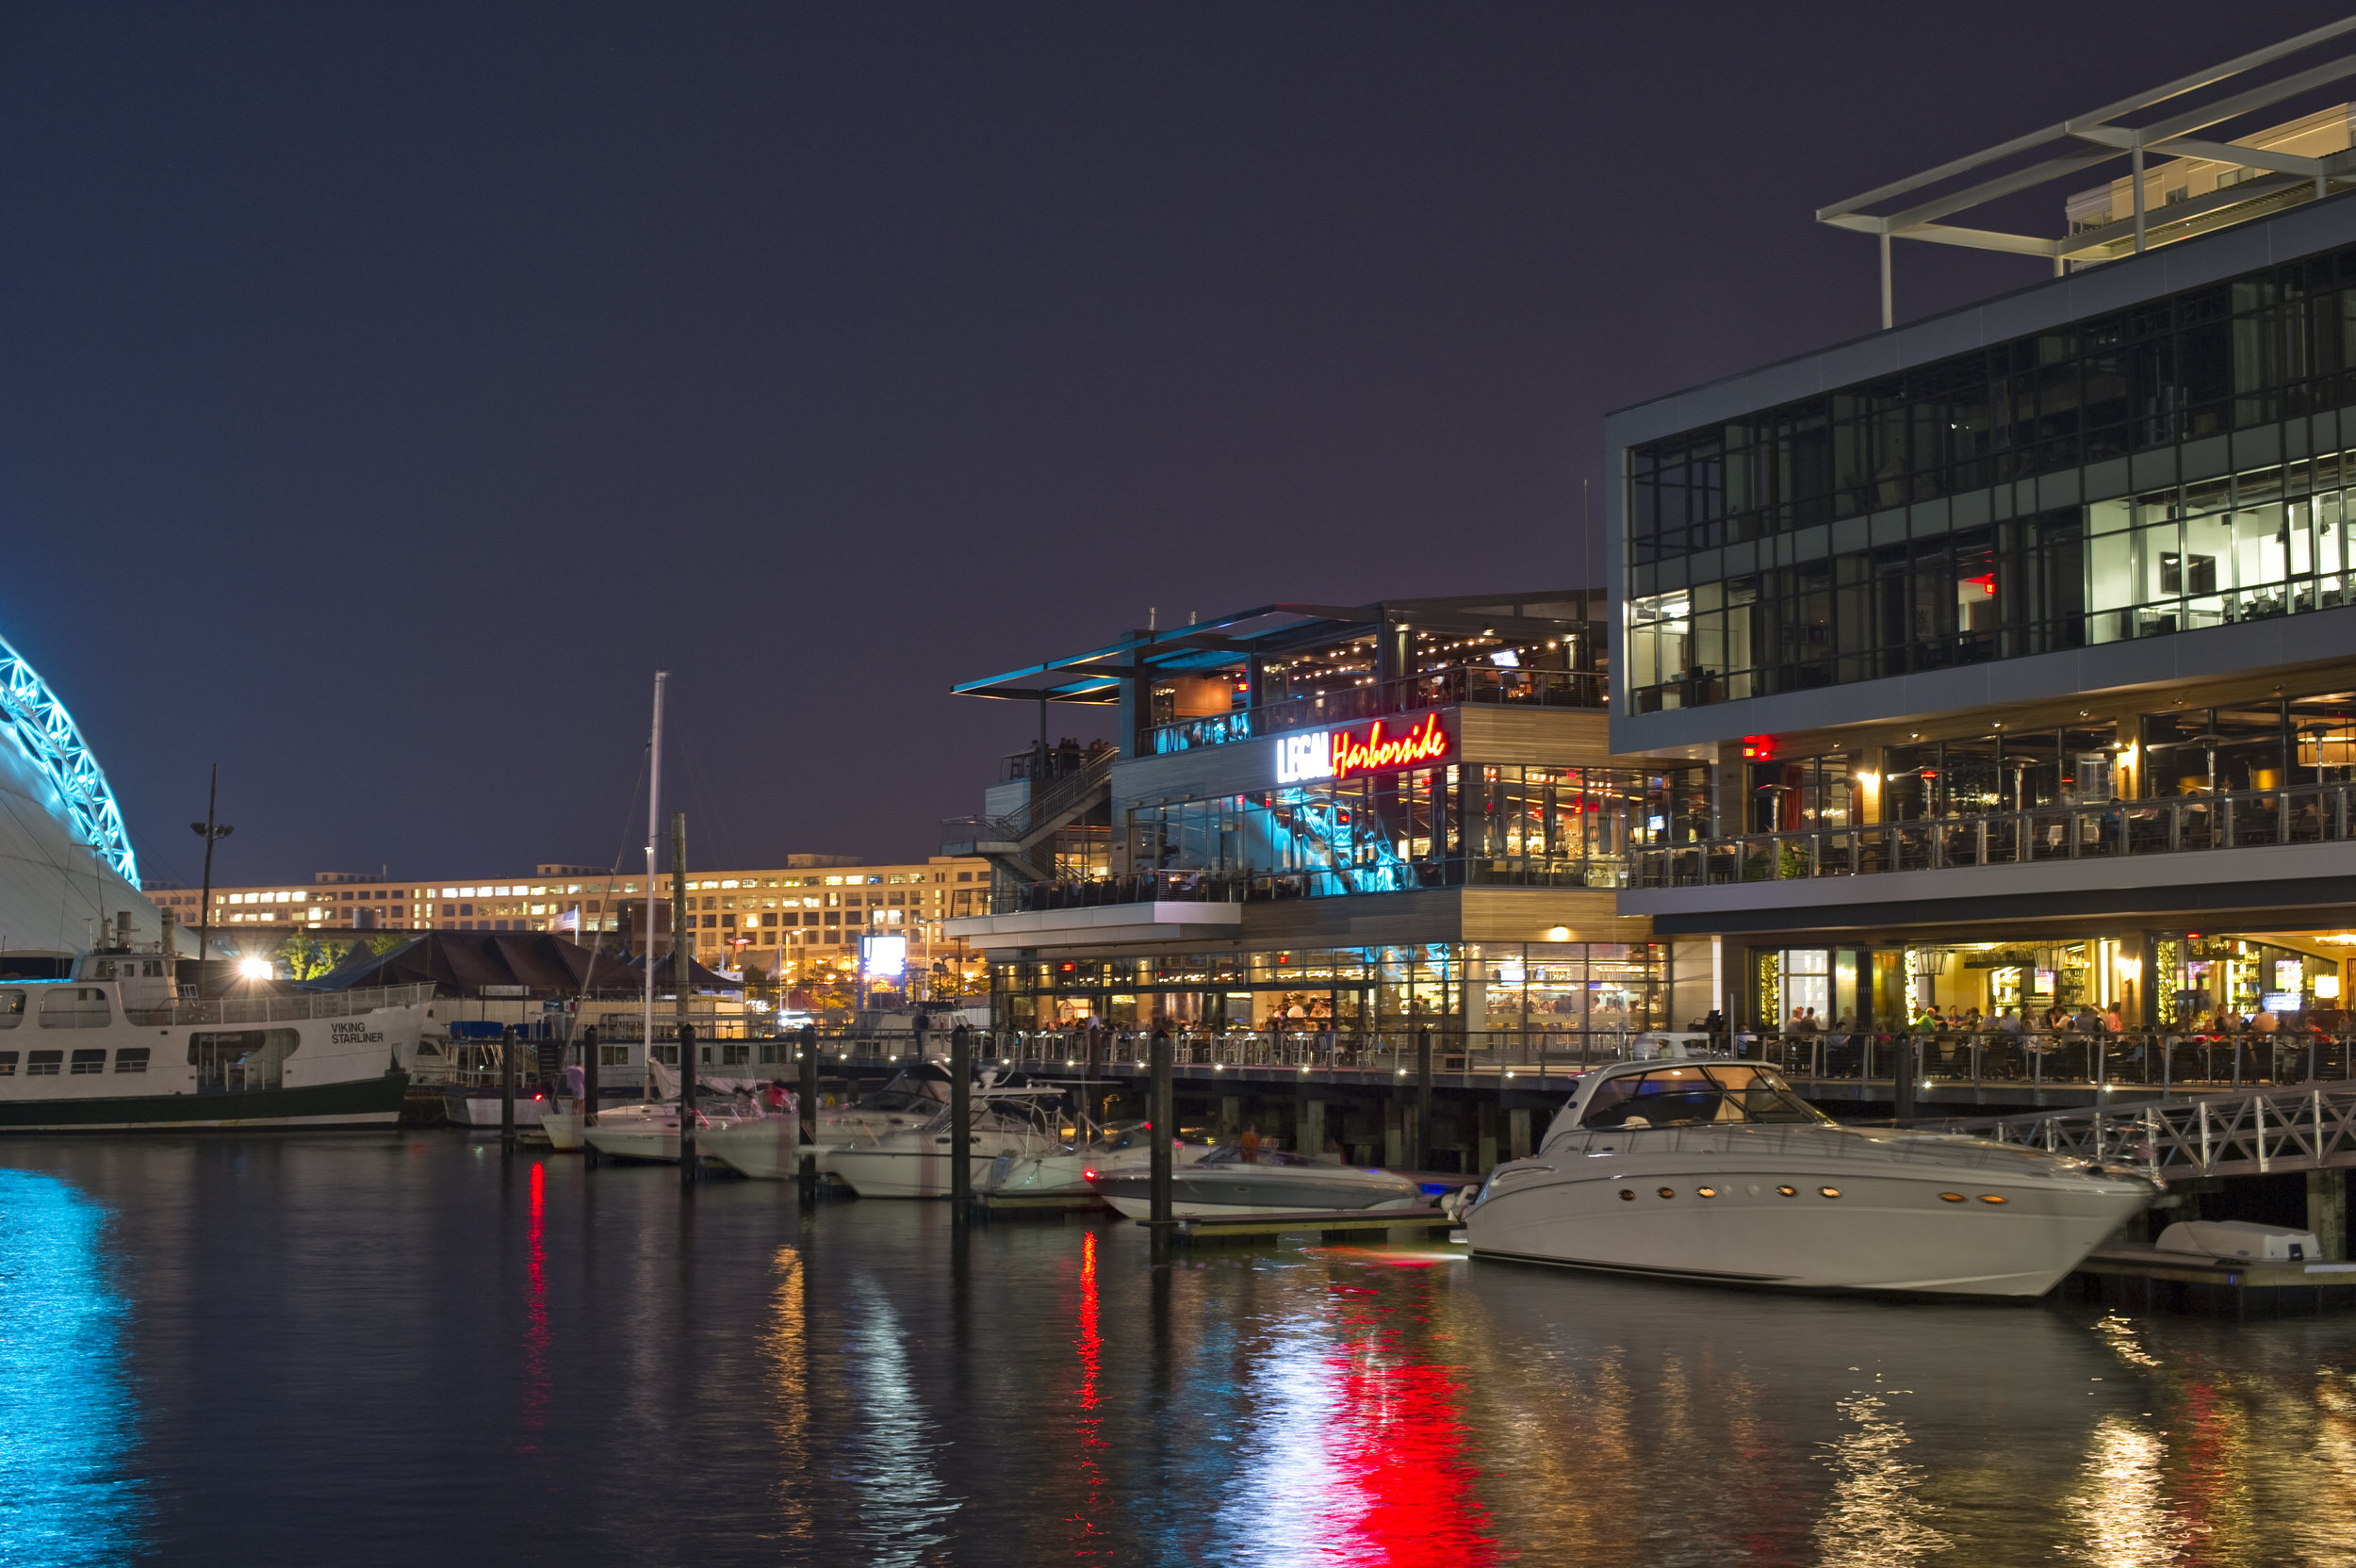 seaport-district-boston-night6.jpg